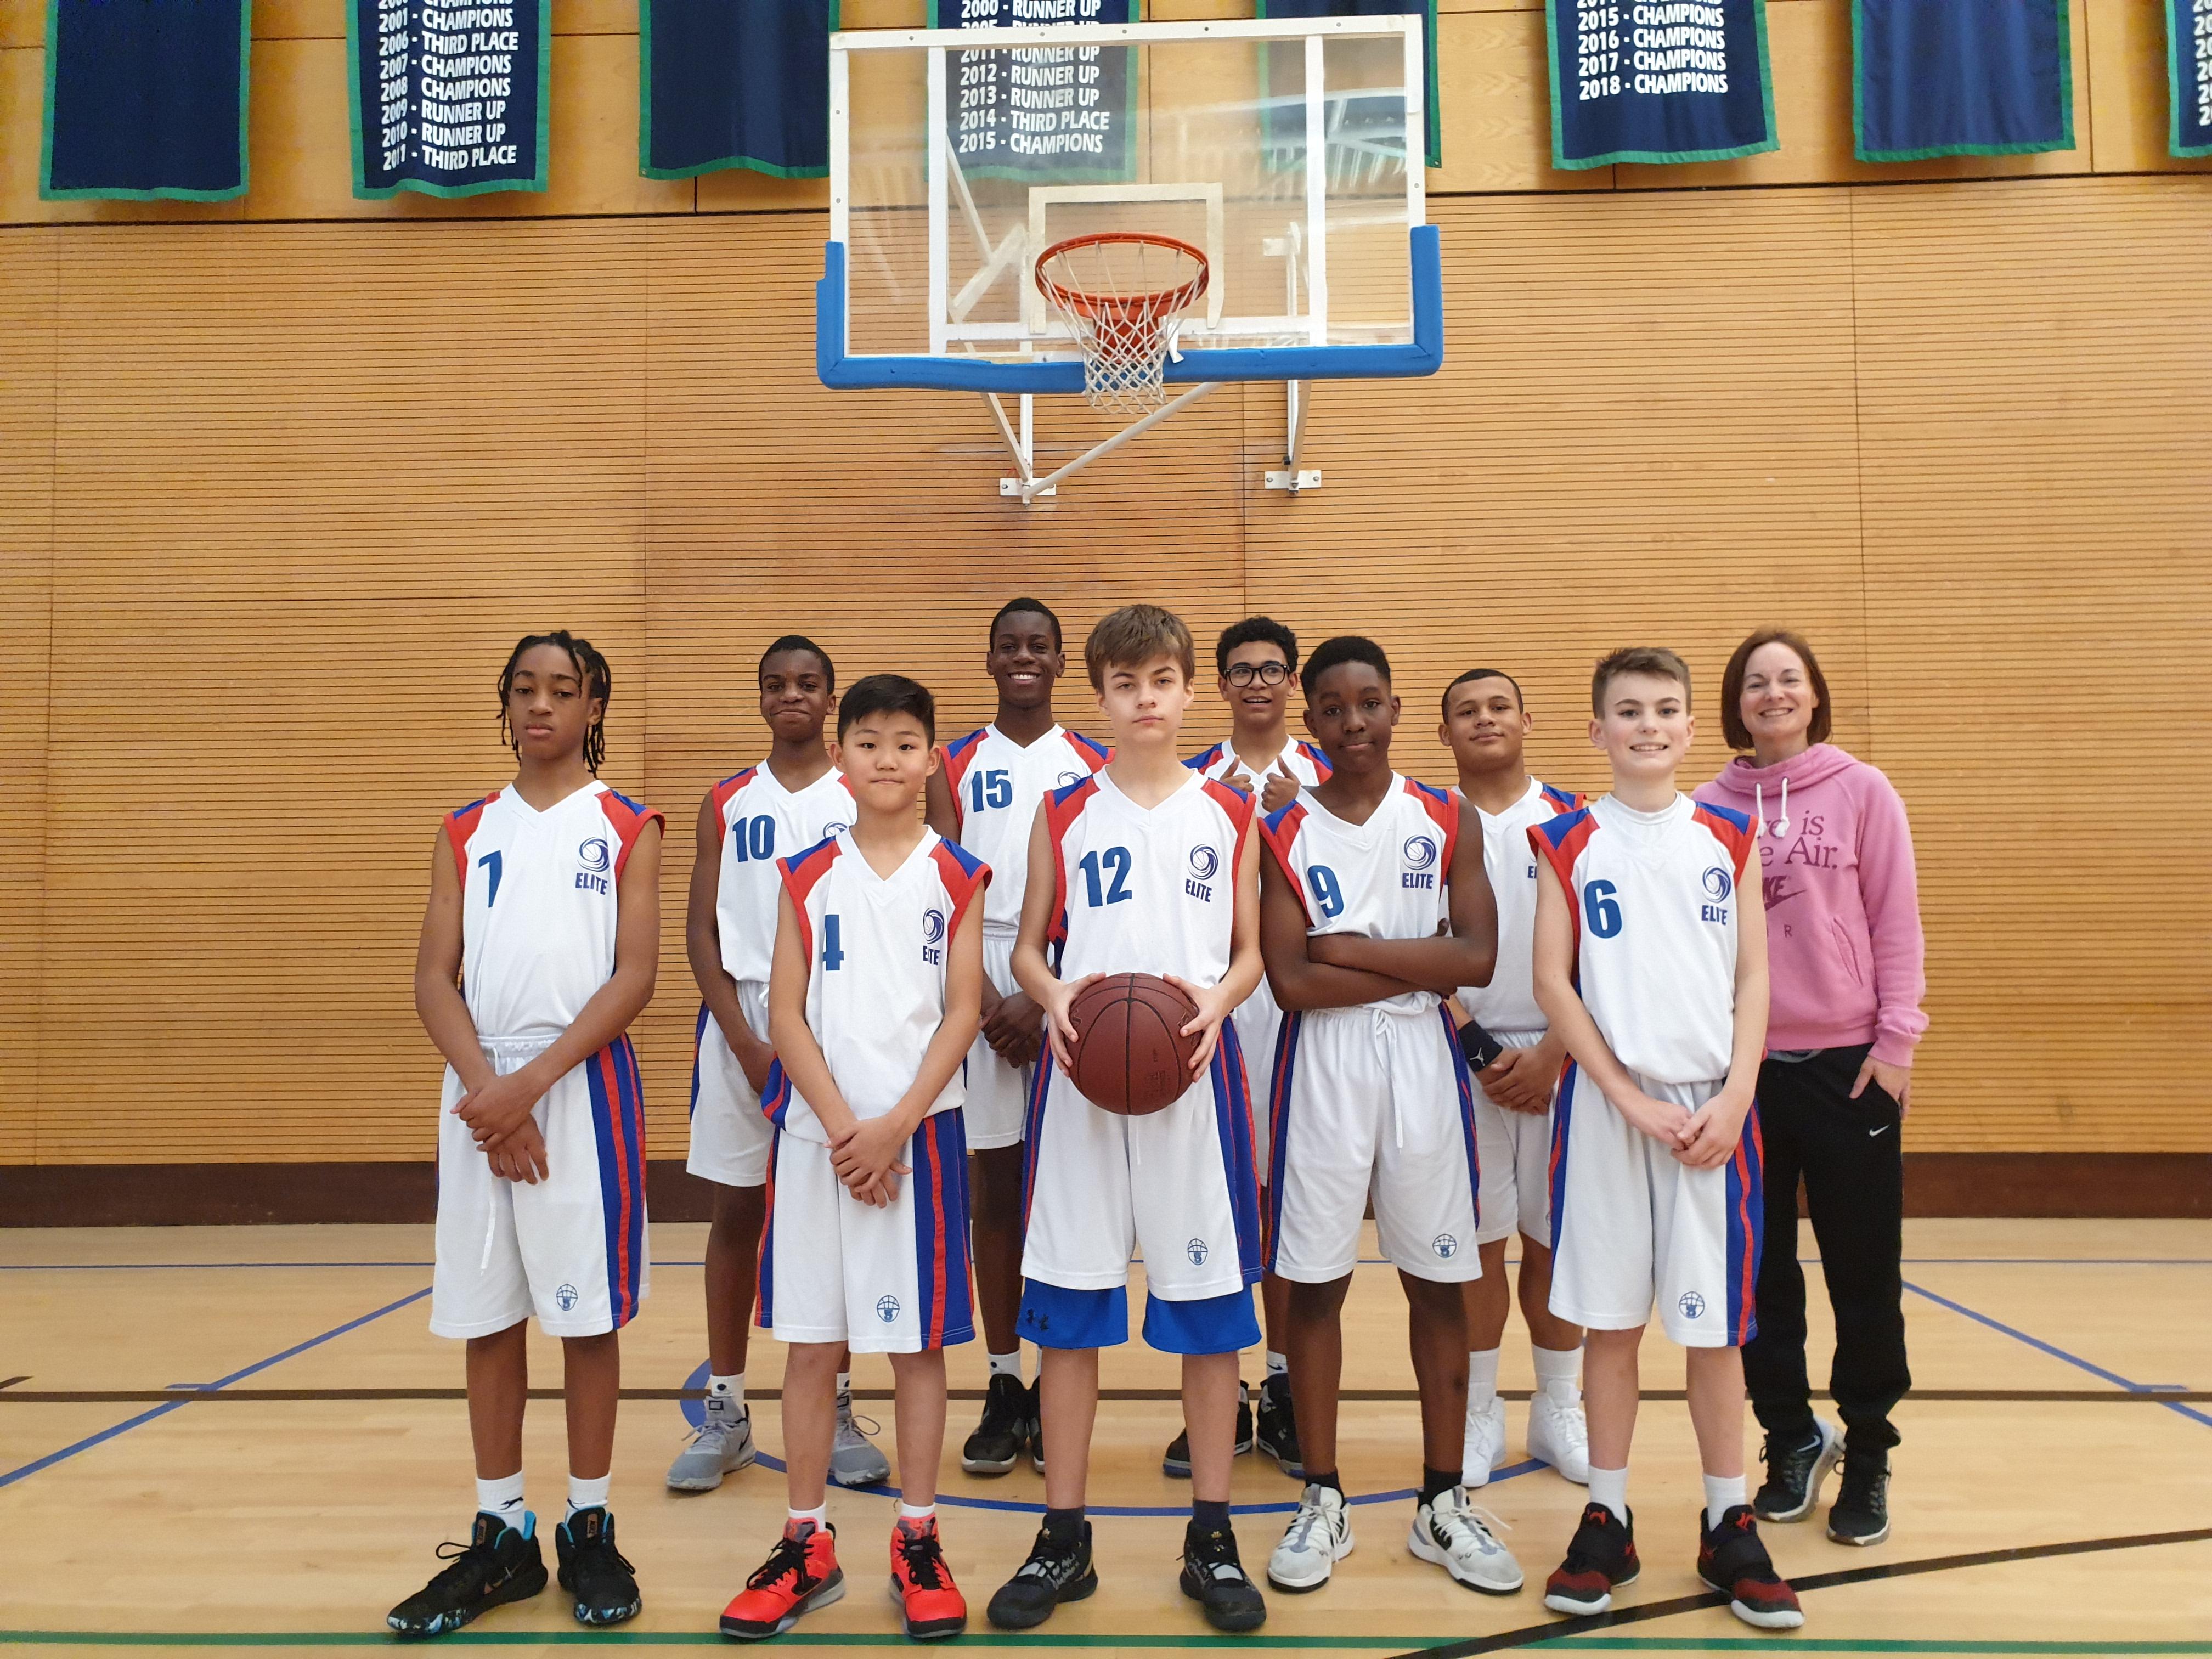 U14s - CVL - Croydon Elite Basketball